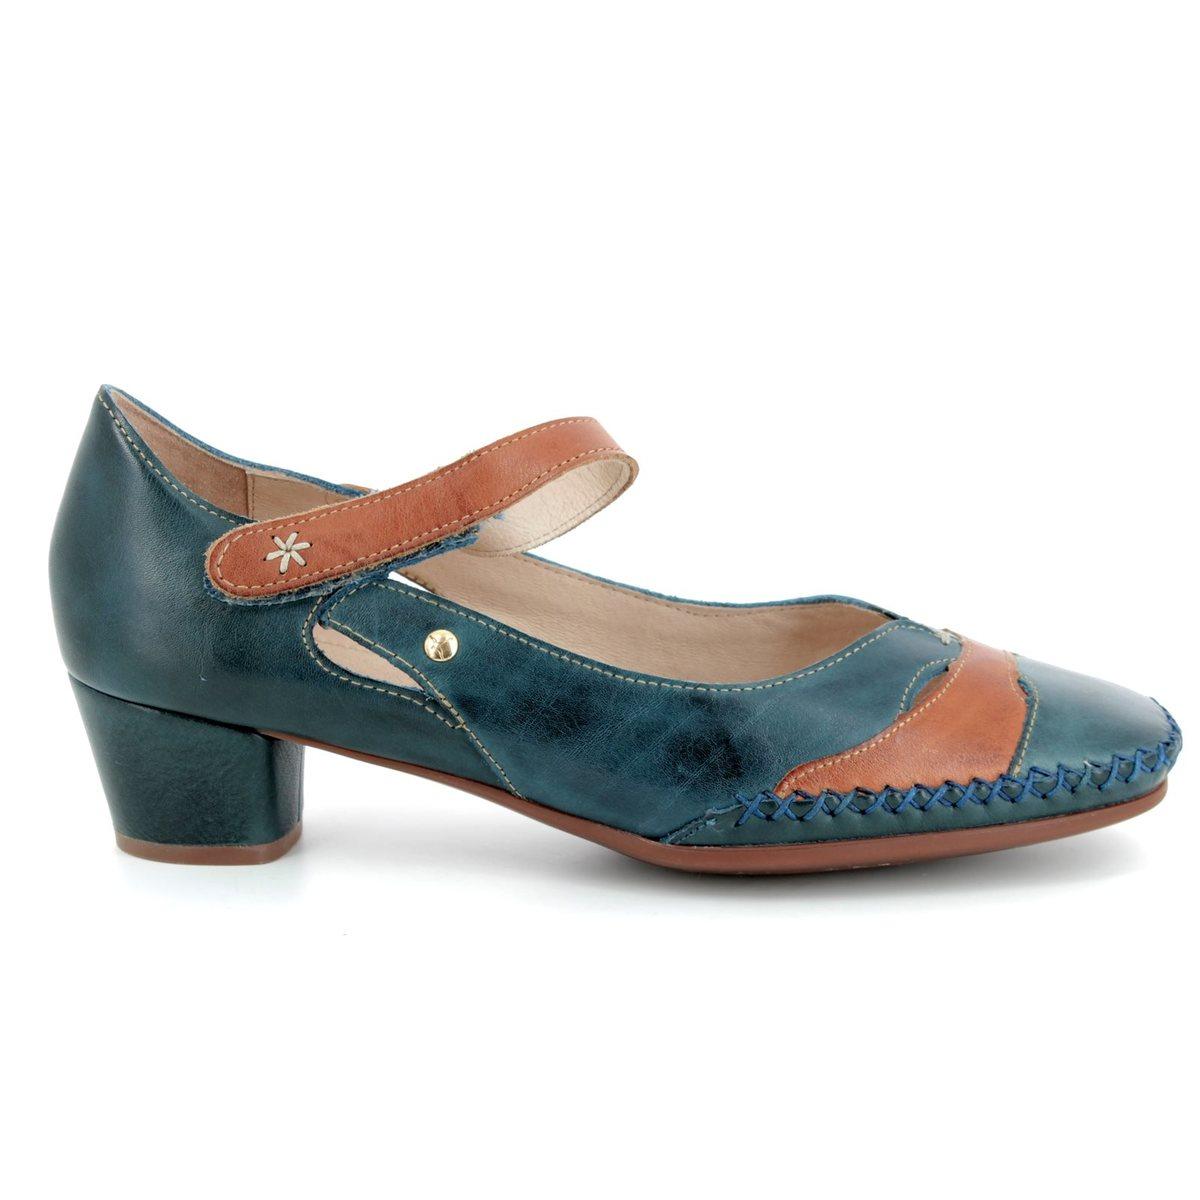 a6d7094984457 Pikolinos Heeled Shoes - Navy-tan - W6R5836/70 GOMERA BAR